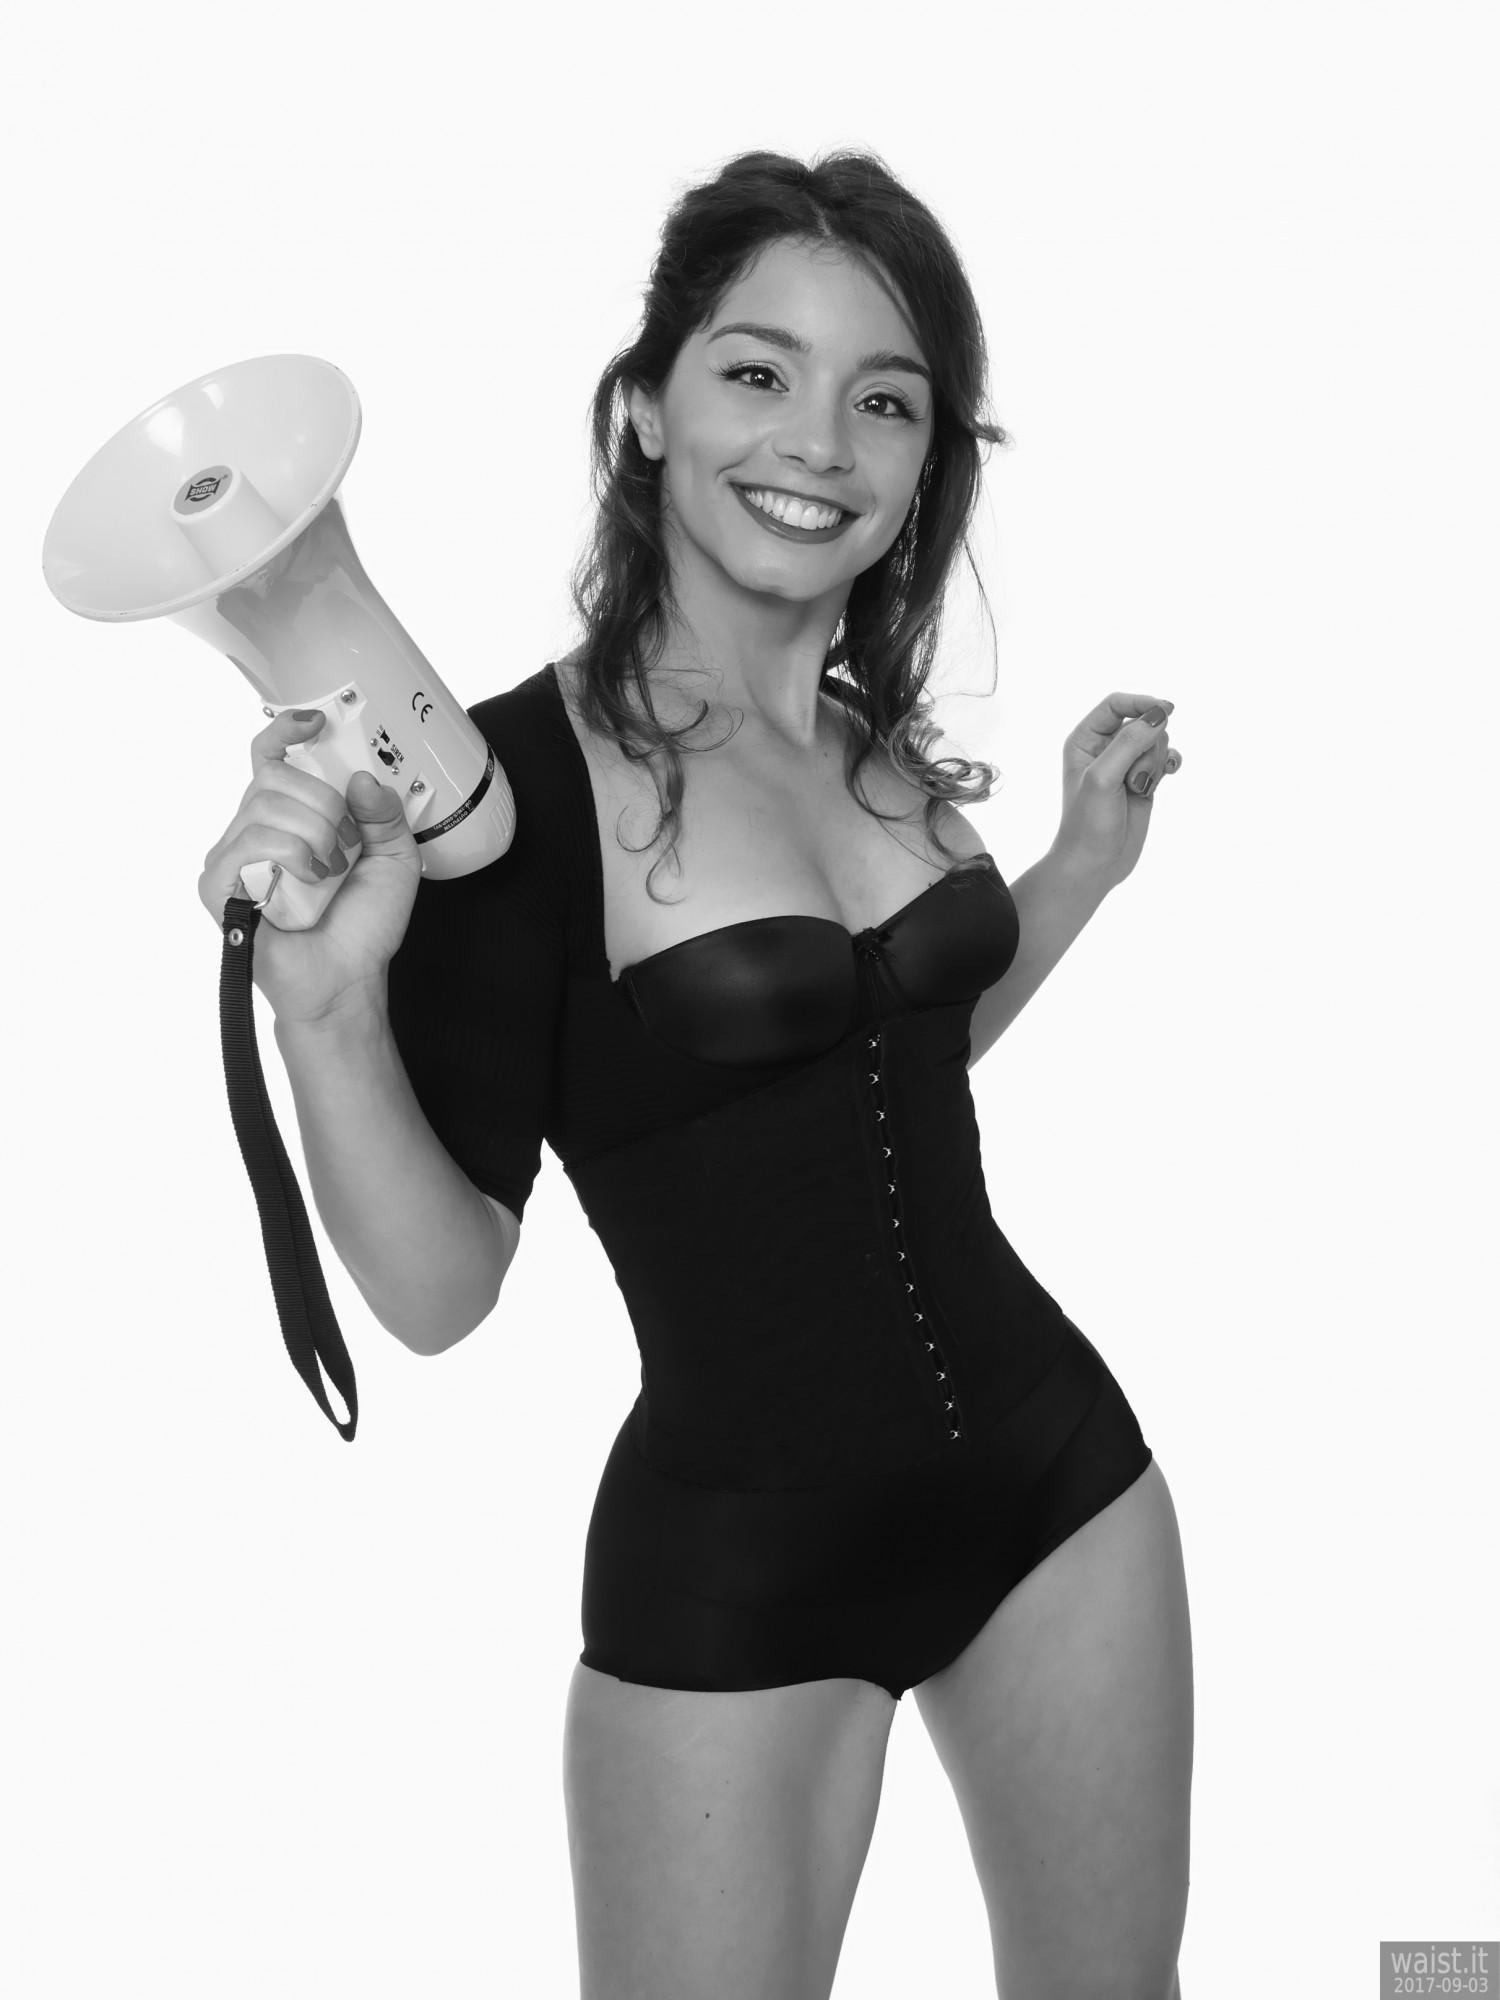 2017-09-03 Kris in black bra, posture top and control briefs worn as hotpants holding megaphone